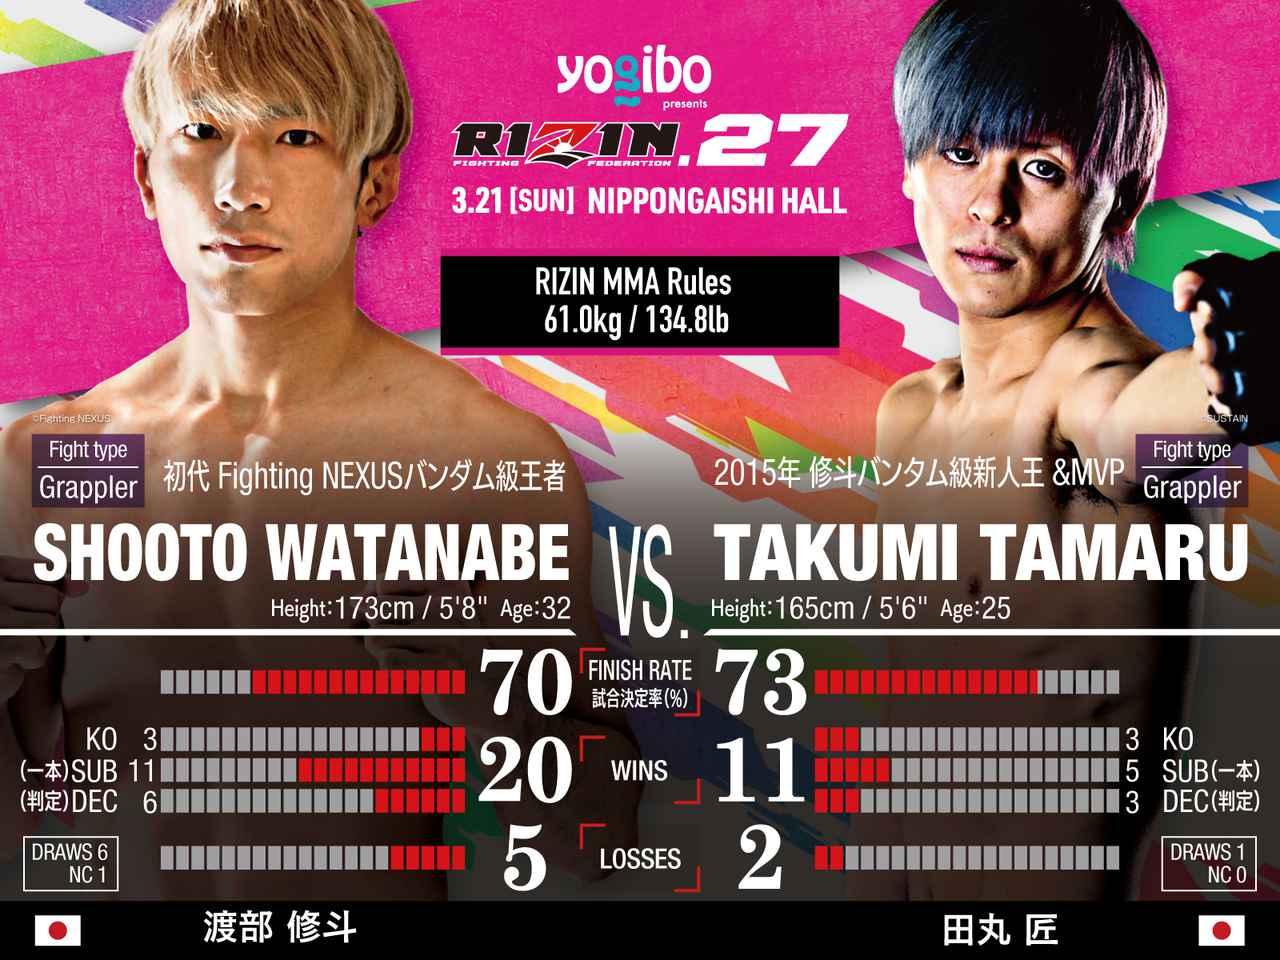 画像: Shooto Watanabe vs Takumi Tamaru